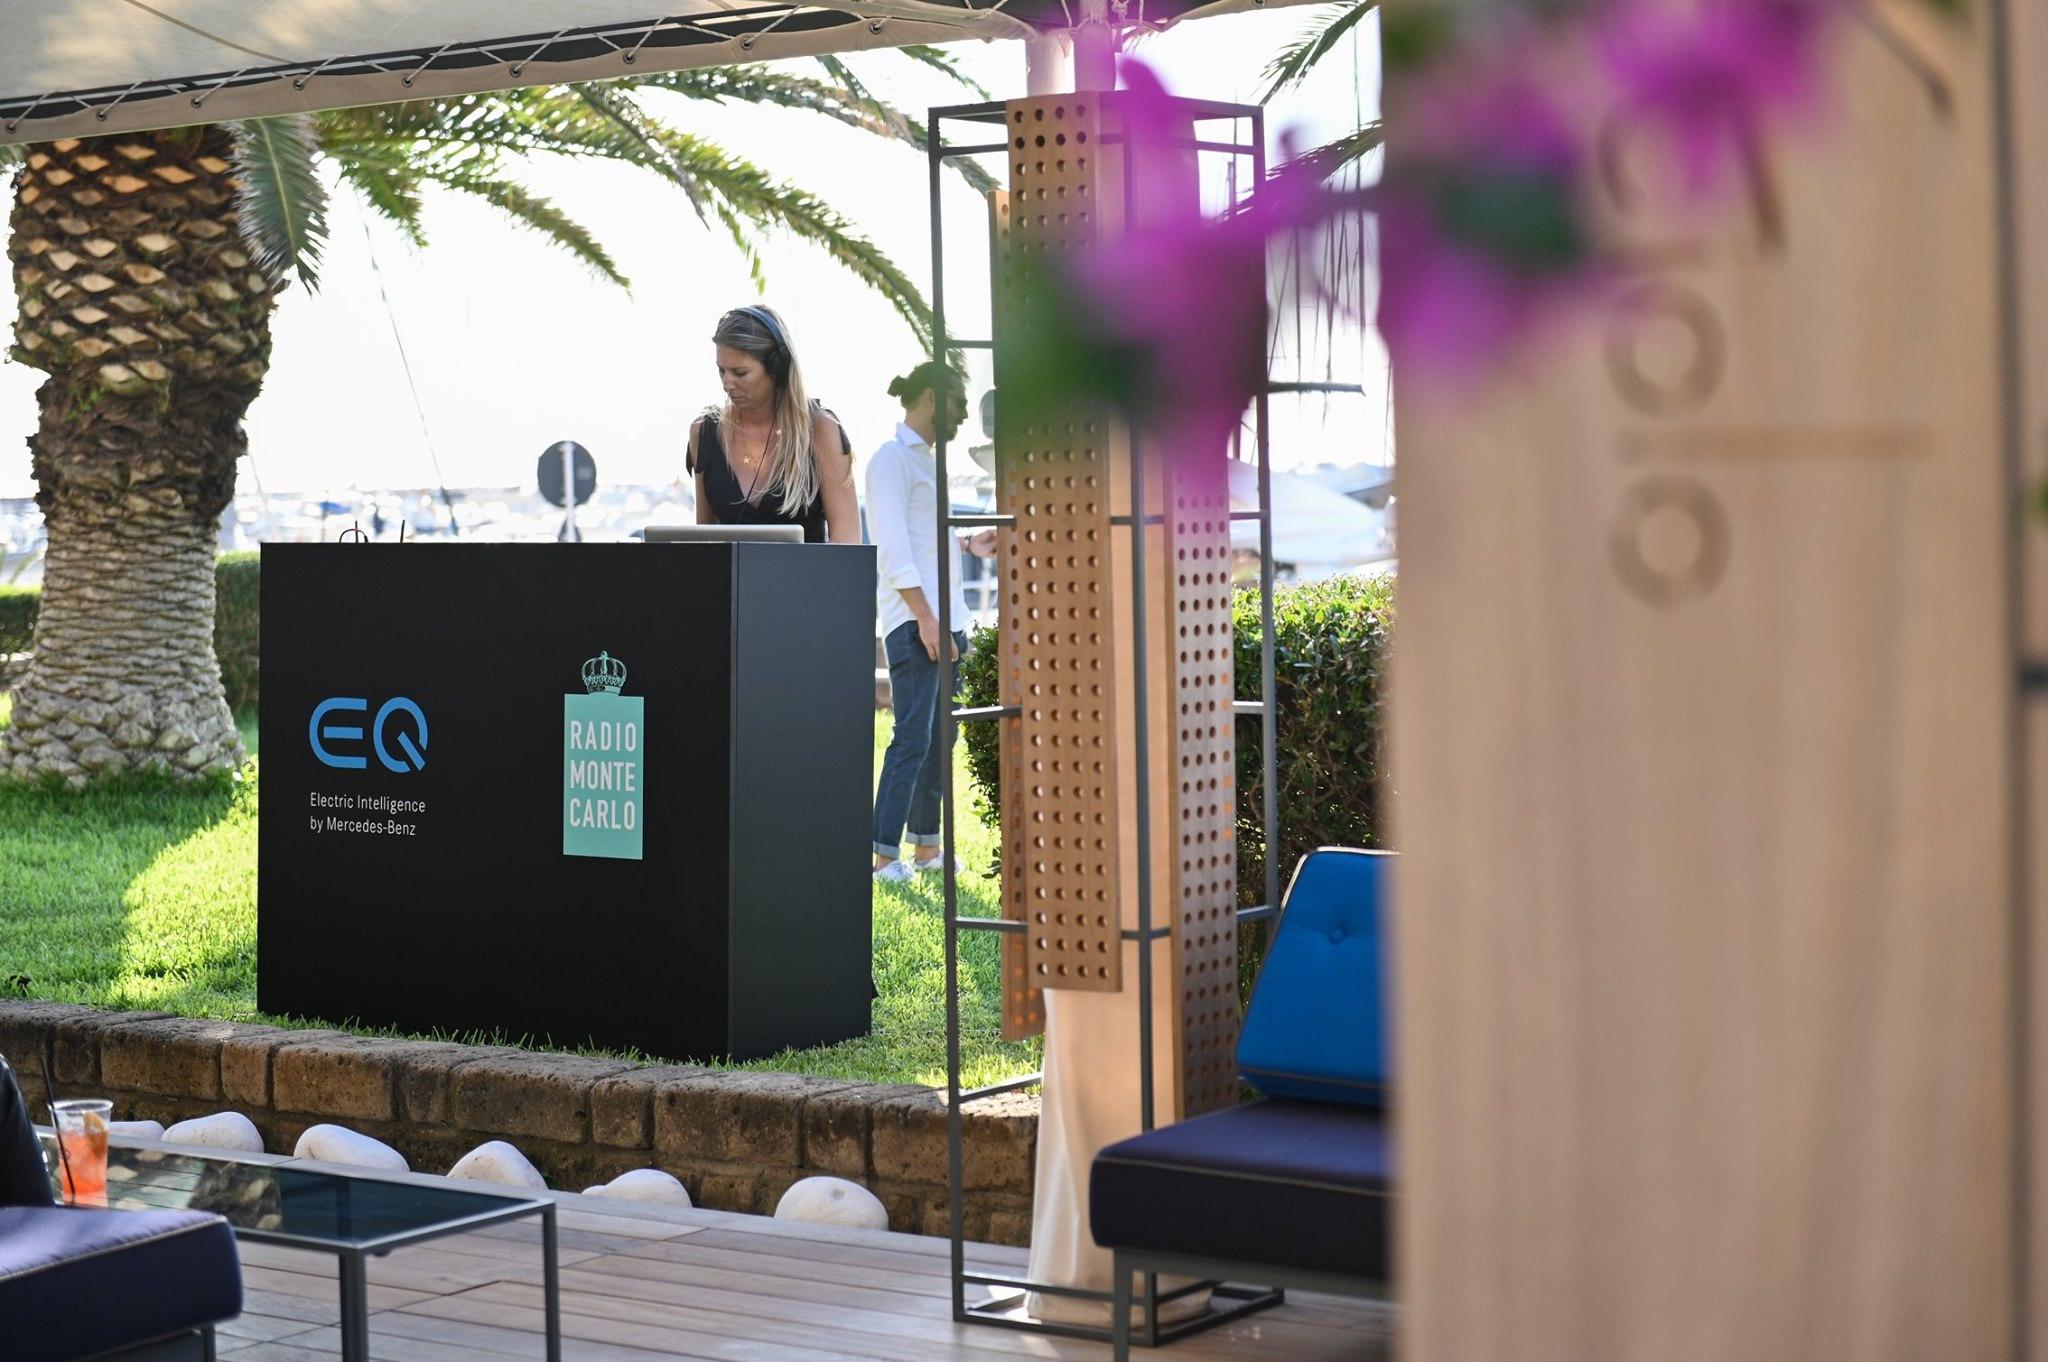 eqc-reveal-tour-gruppo-peroni-eventi-05